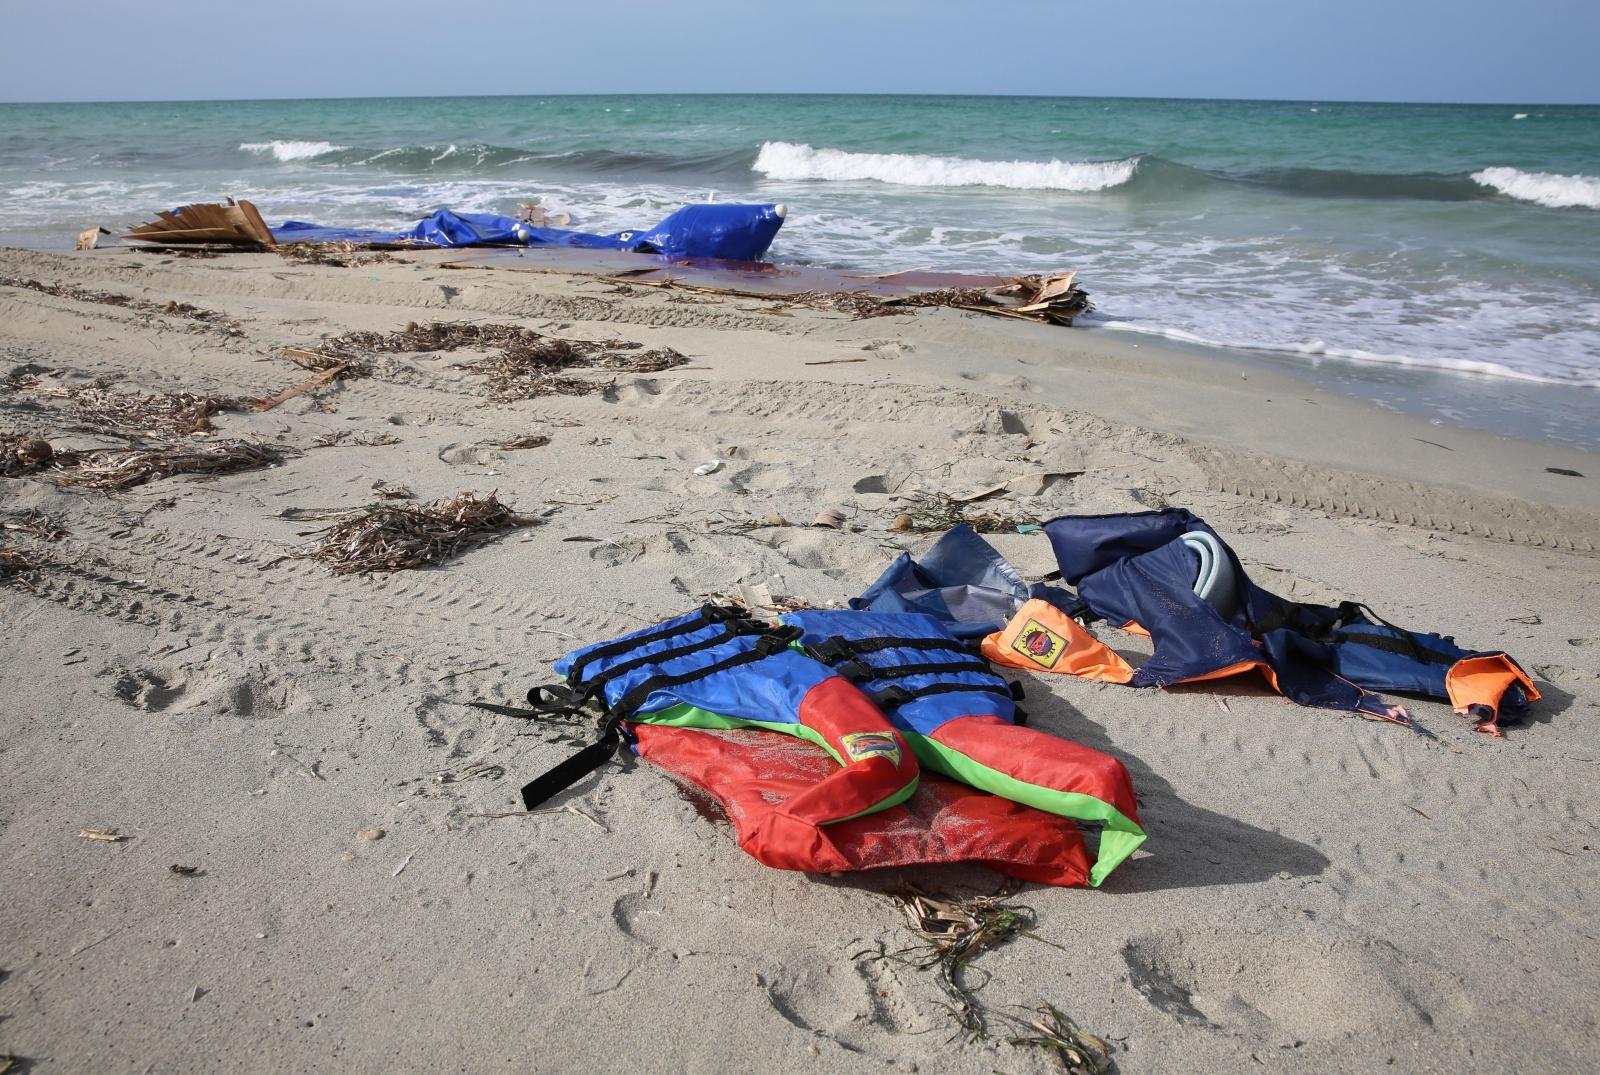 Life jackets washed up Mediterranean coast